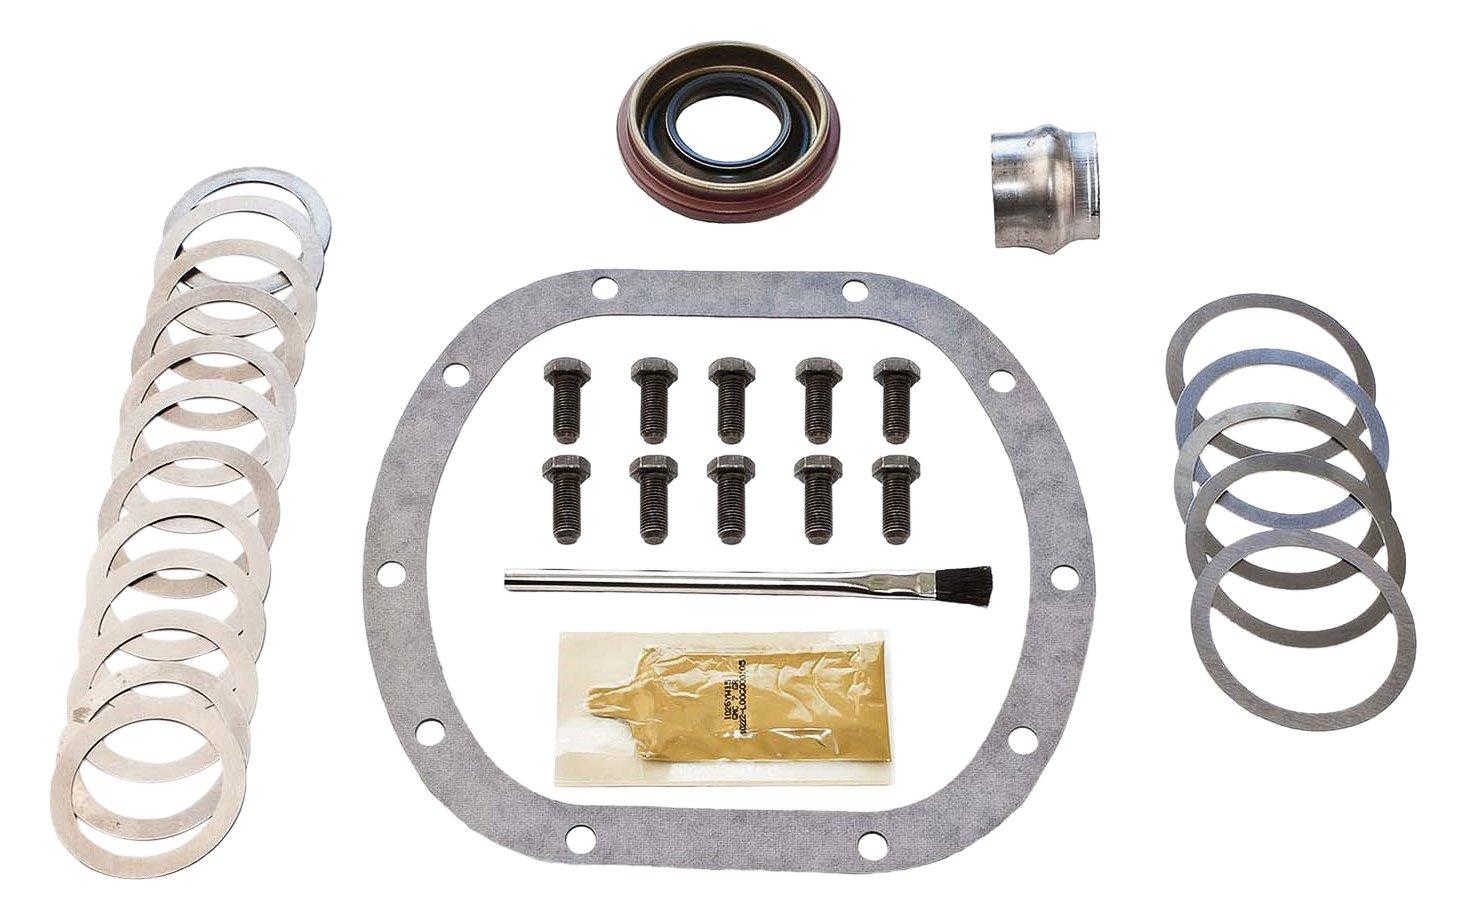 Motive Gear Performance Differential D30IKTJ Motive Gear-Differential Gear Install Kit Differential Gear Install Kit